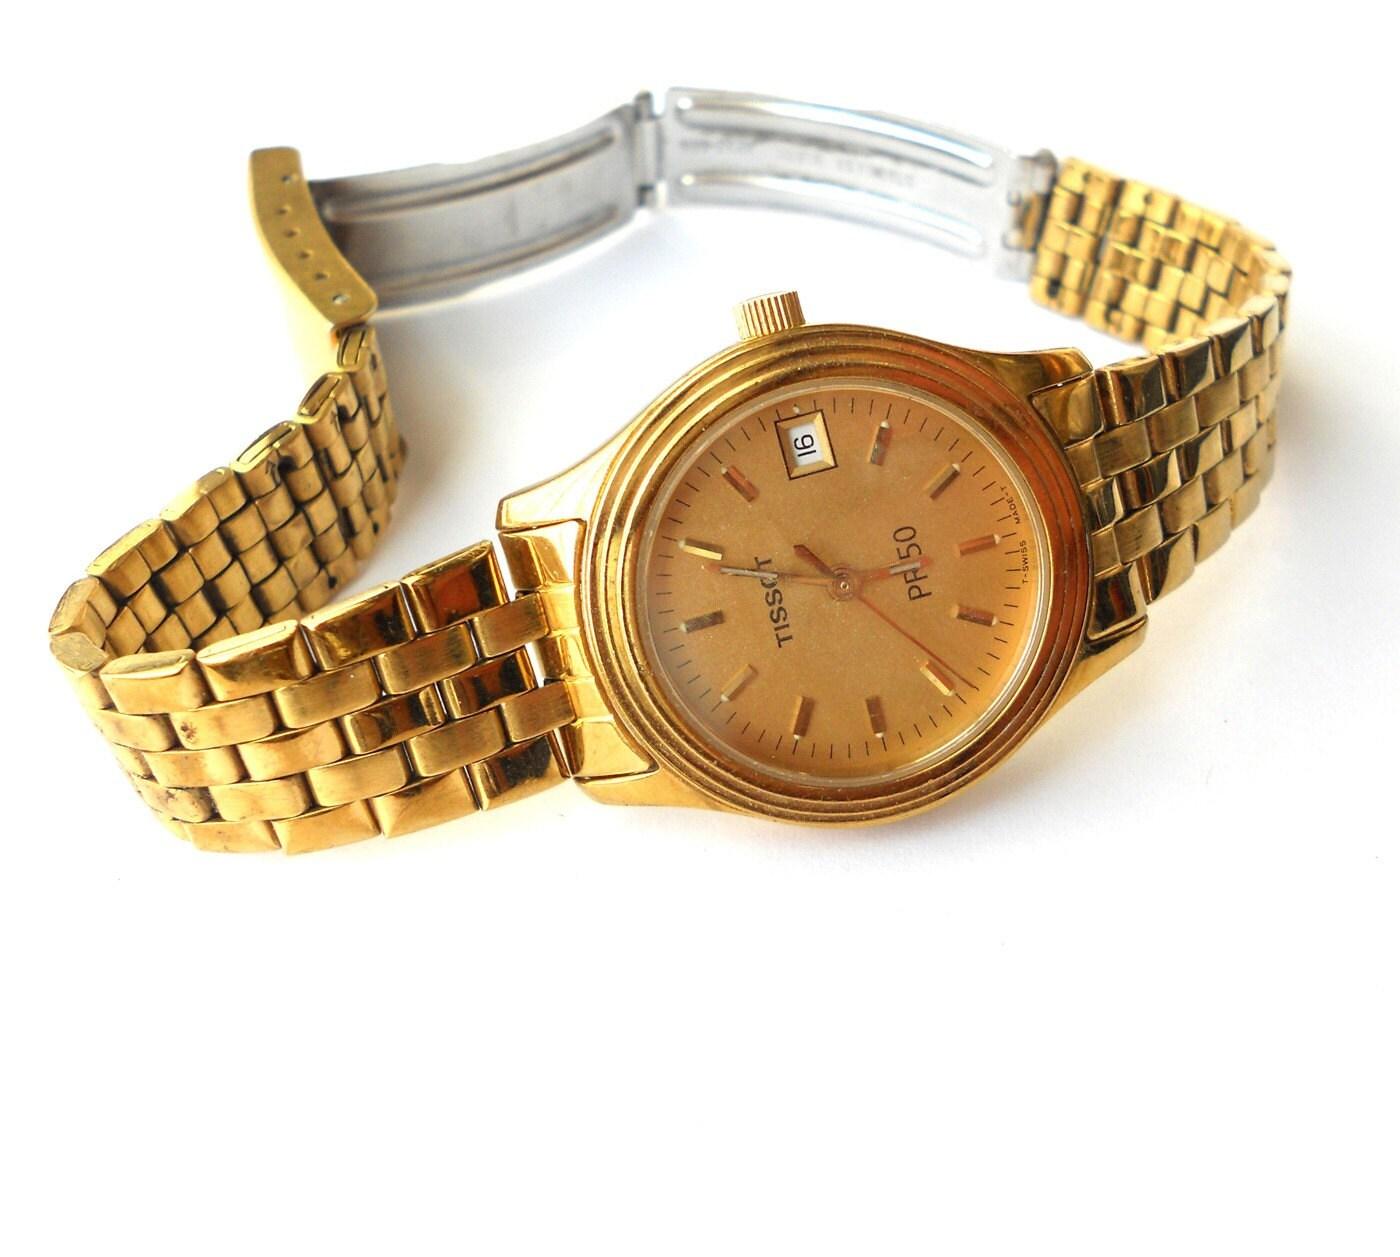 PR 50 Tissot Все часы коллекции PR 50 Tissot на dekaua